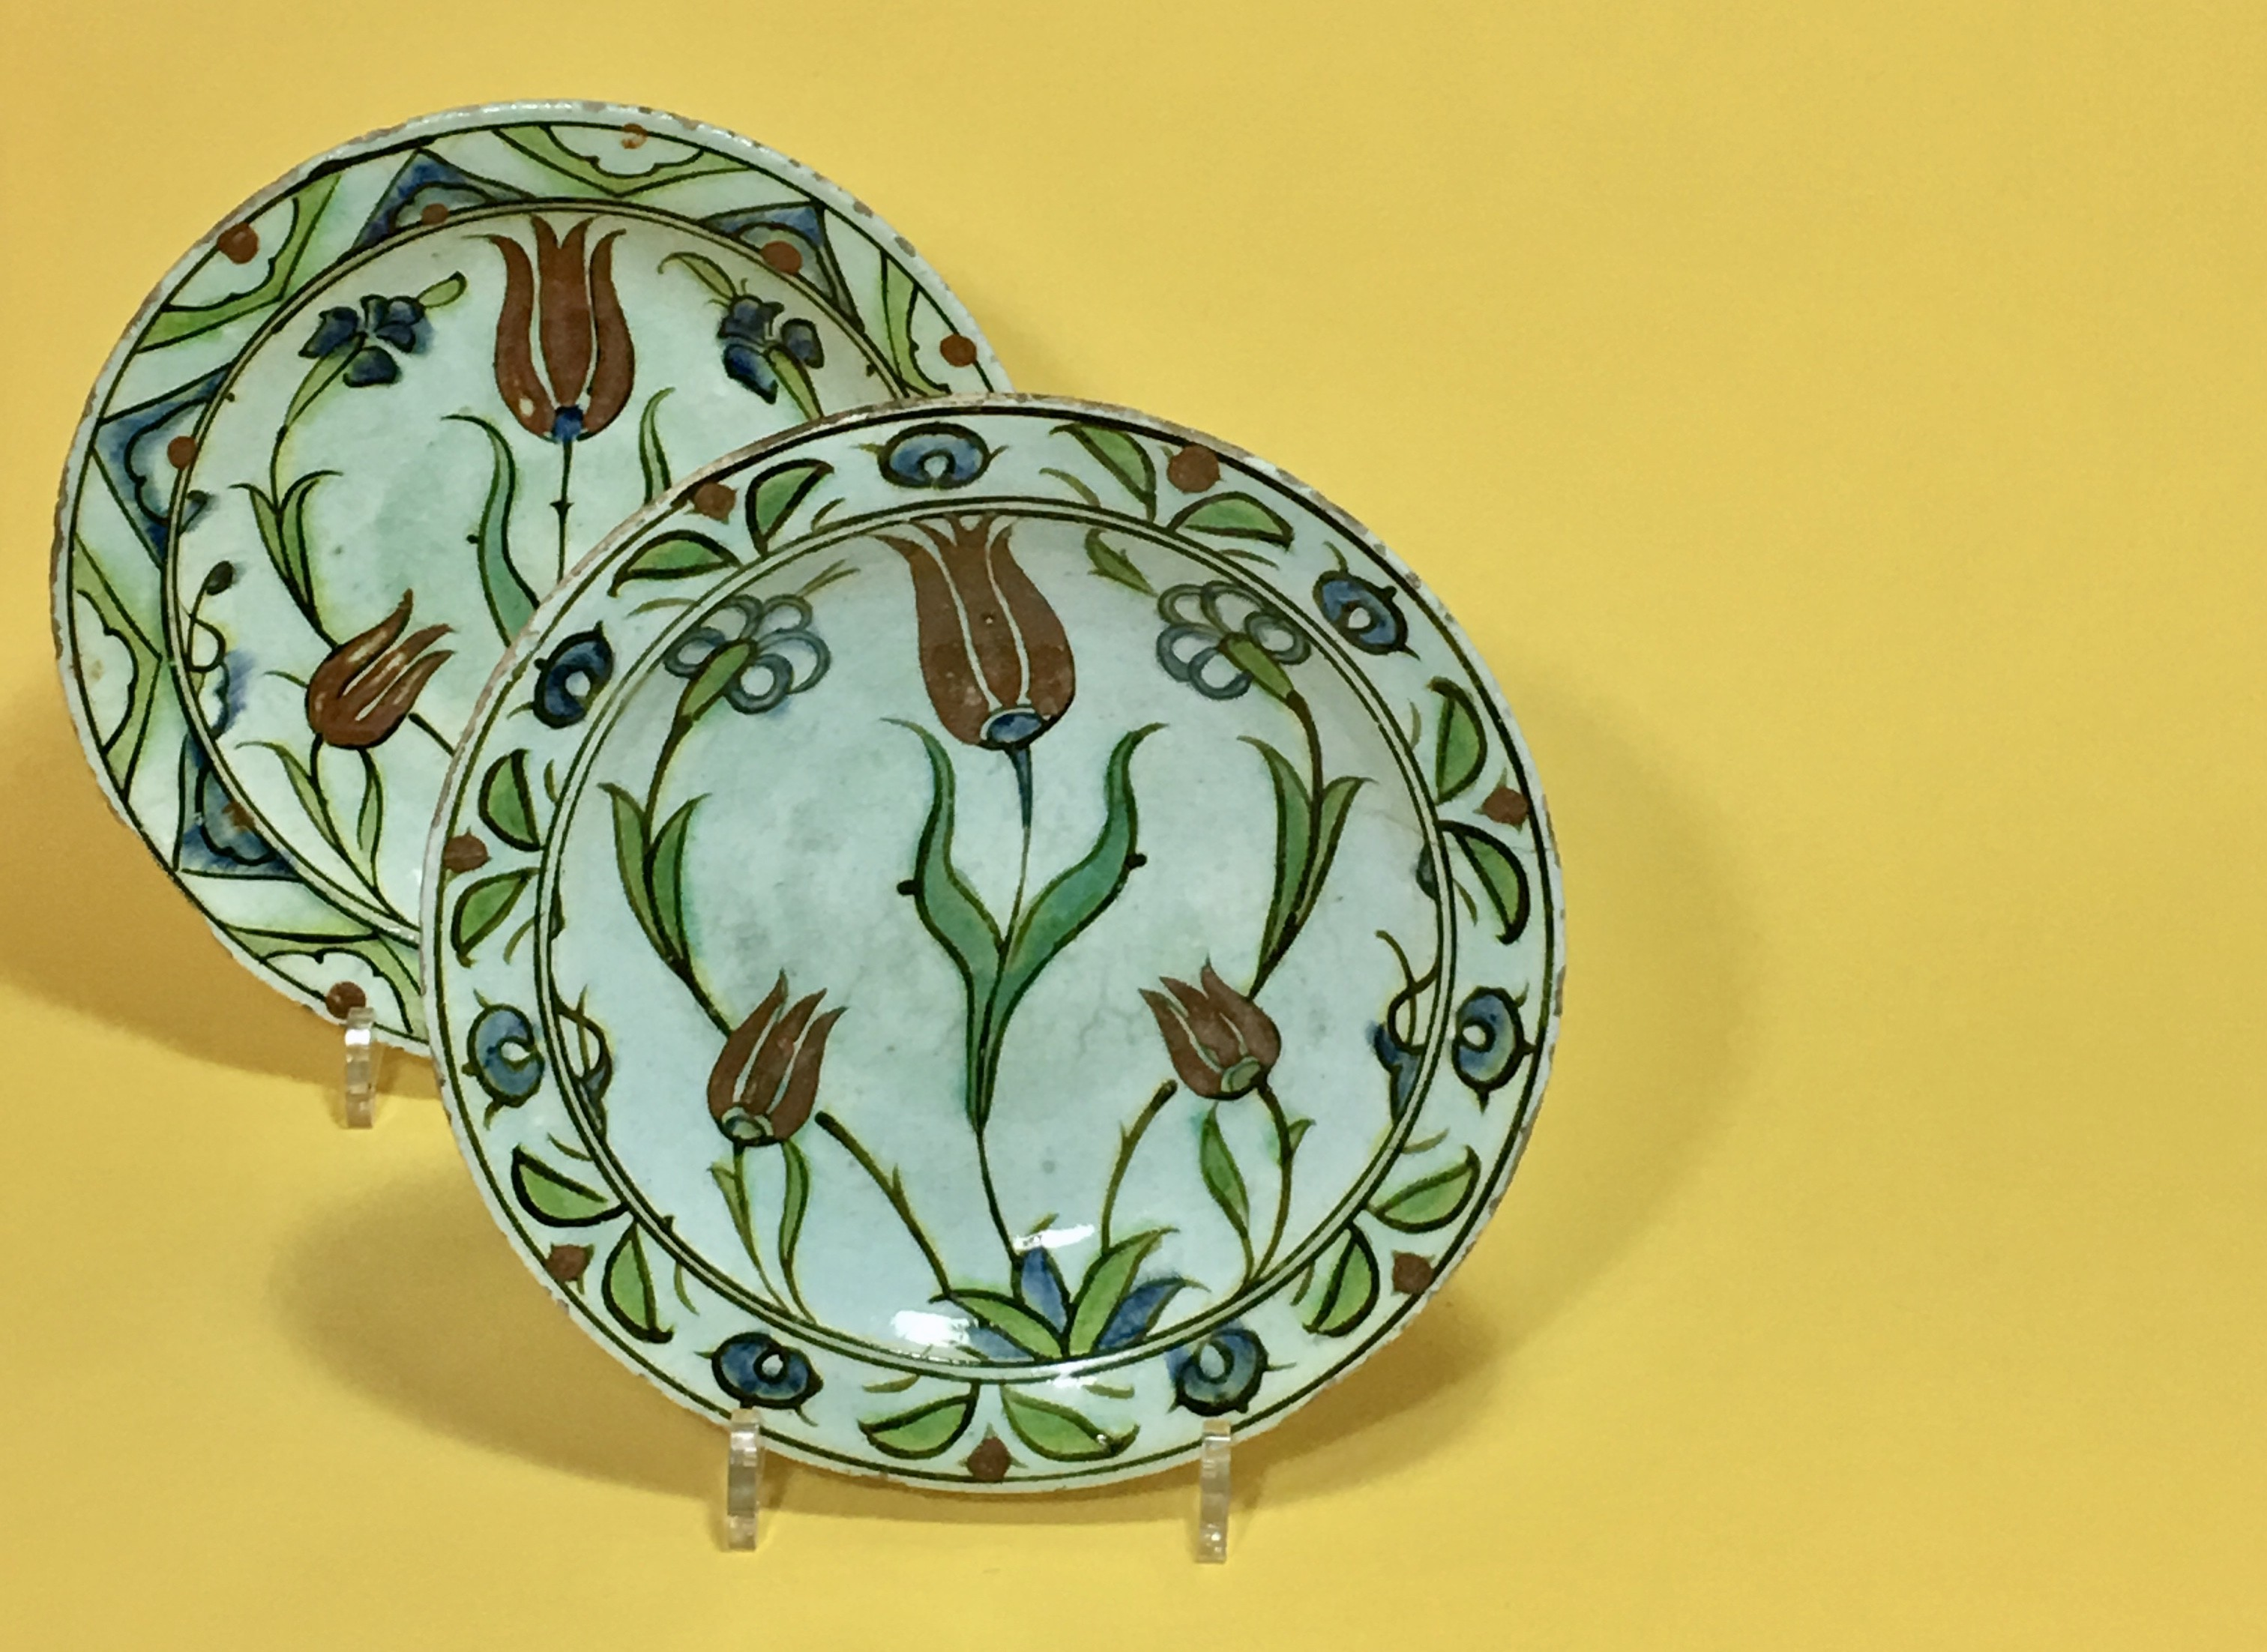 Iznik - dishes Pair of tulips - seventeenth century